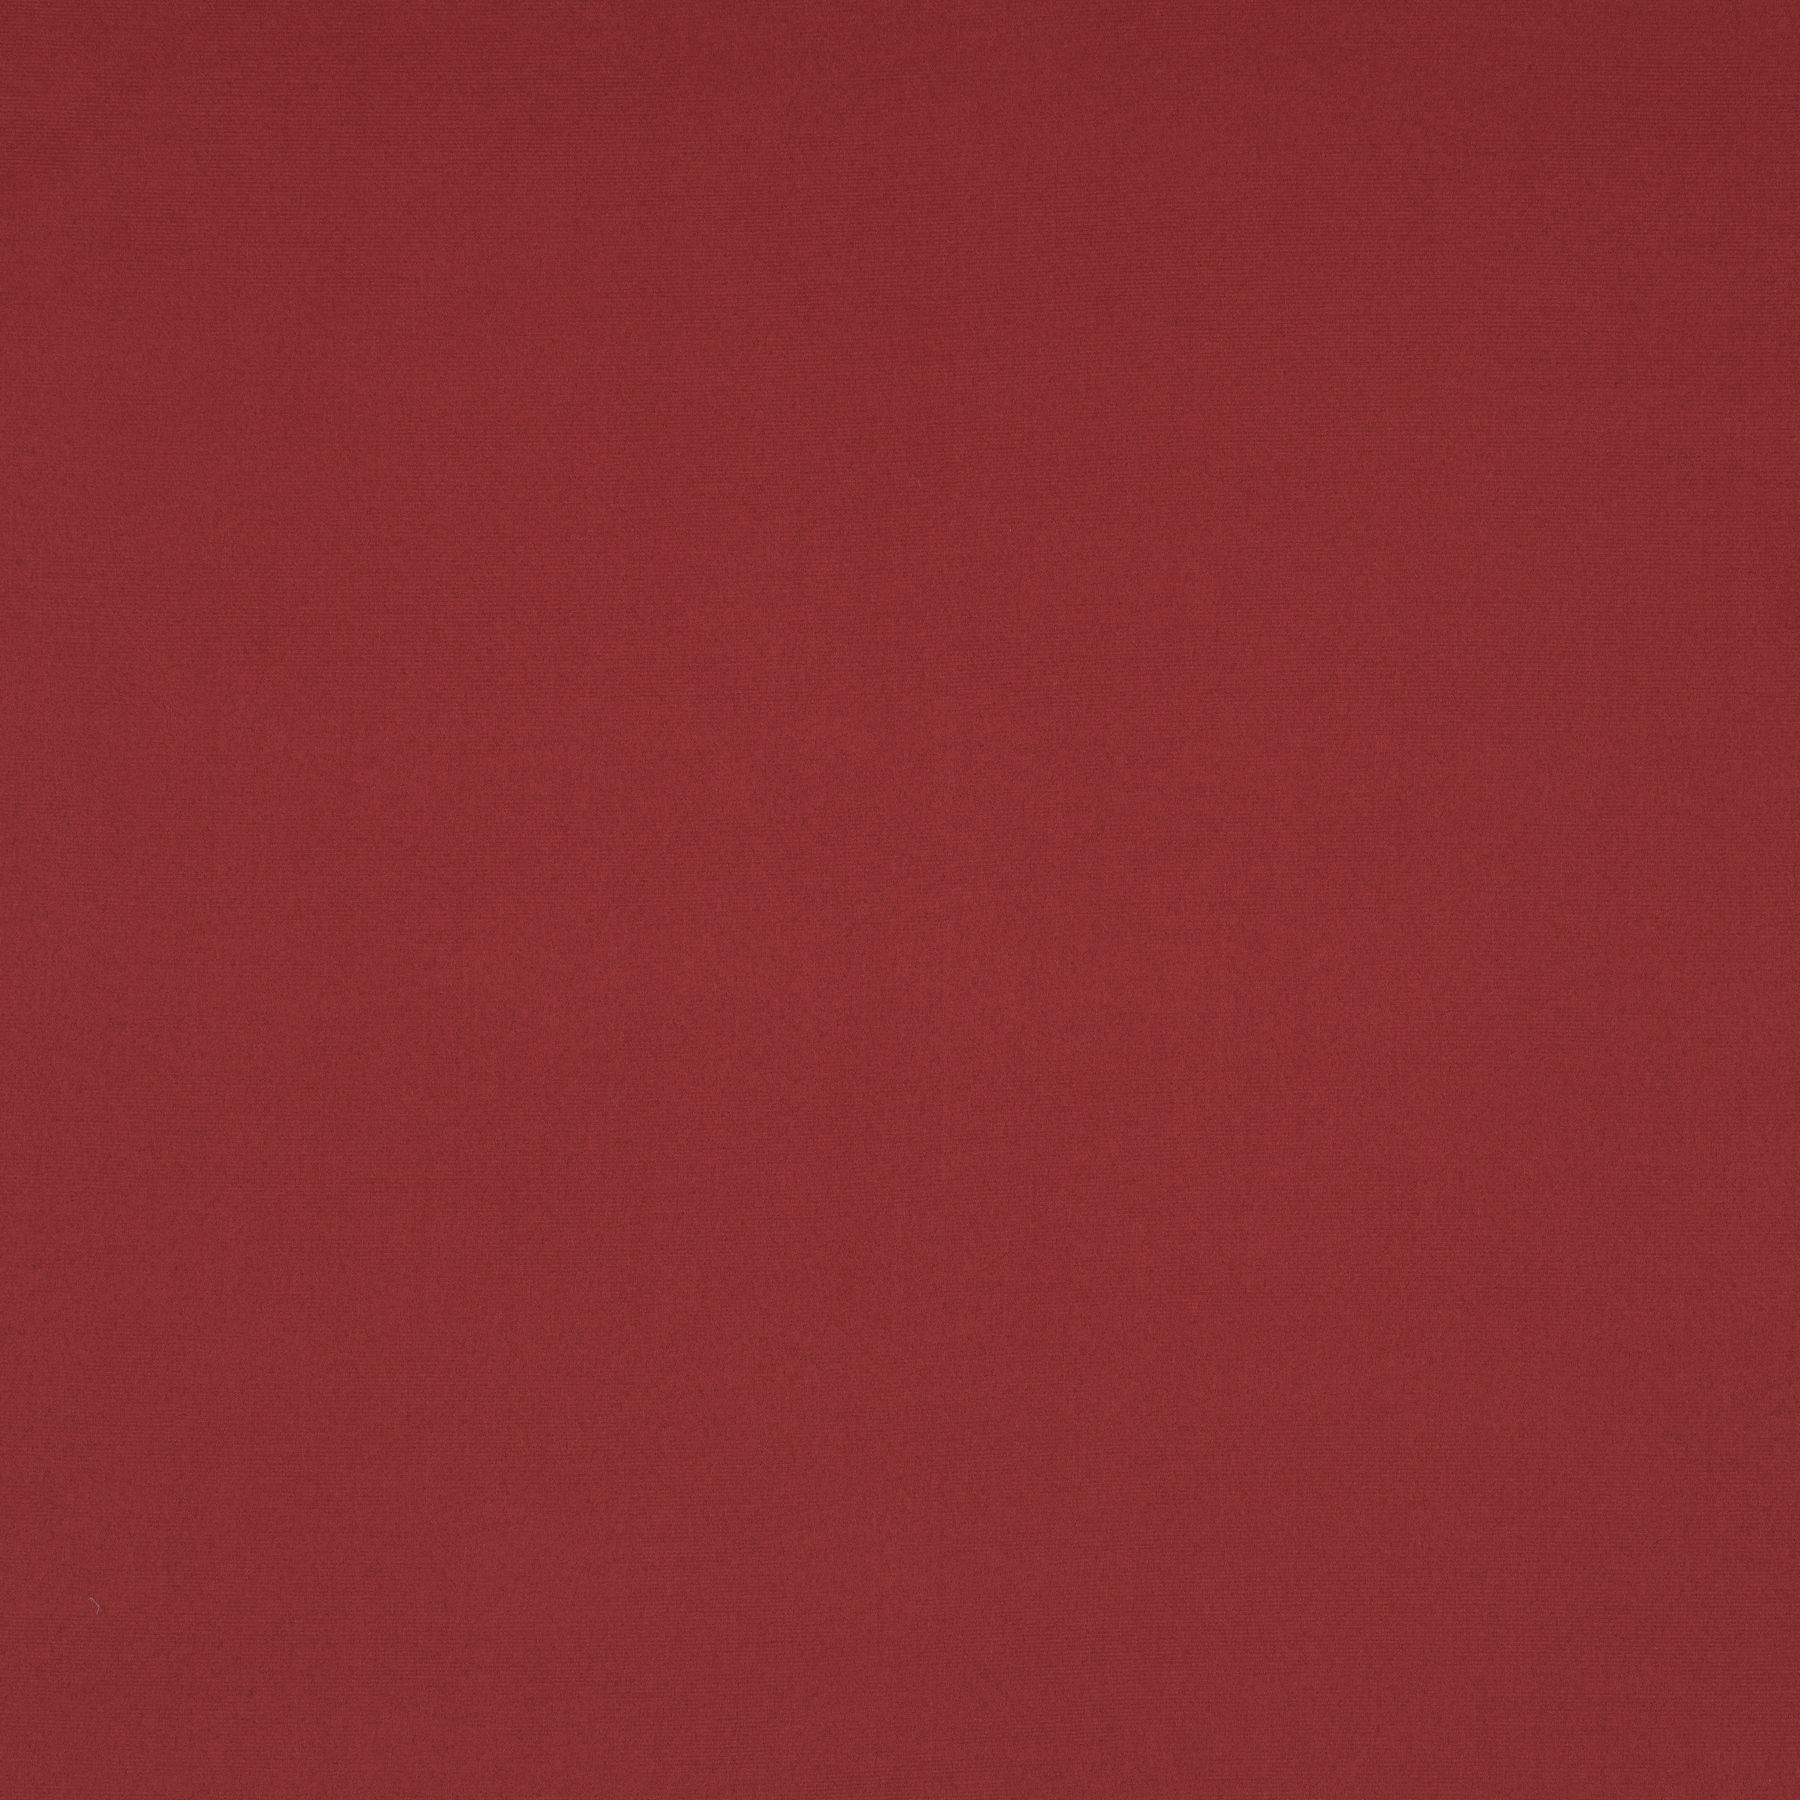 upholstery fabric action 1 3104 010 jab anstoetz fabrics. Black Bedroom Furniture Sets. Home Design Ideas